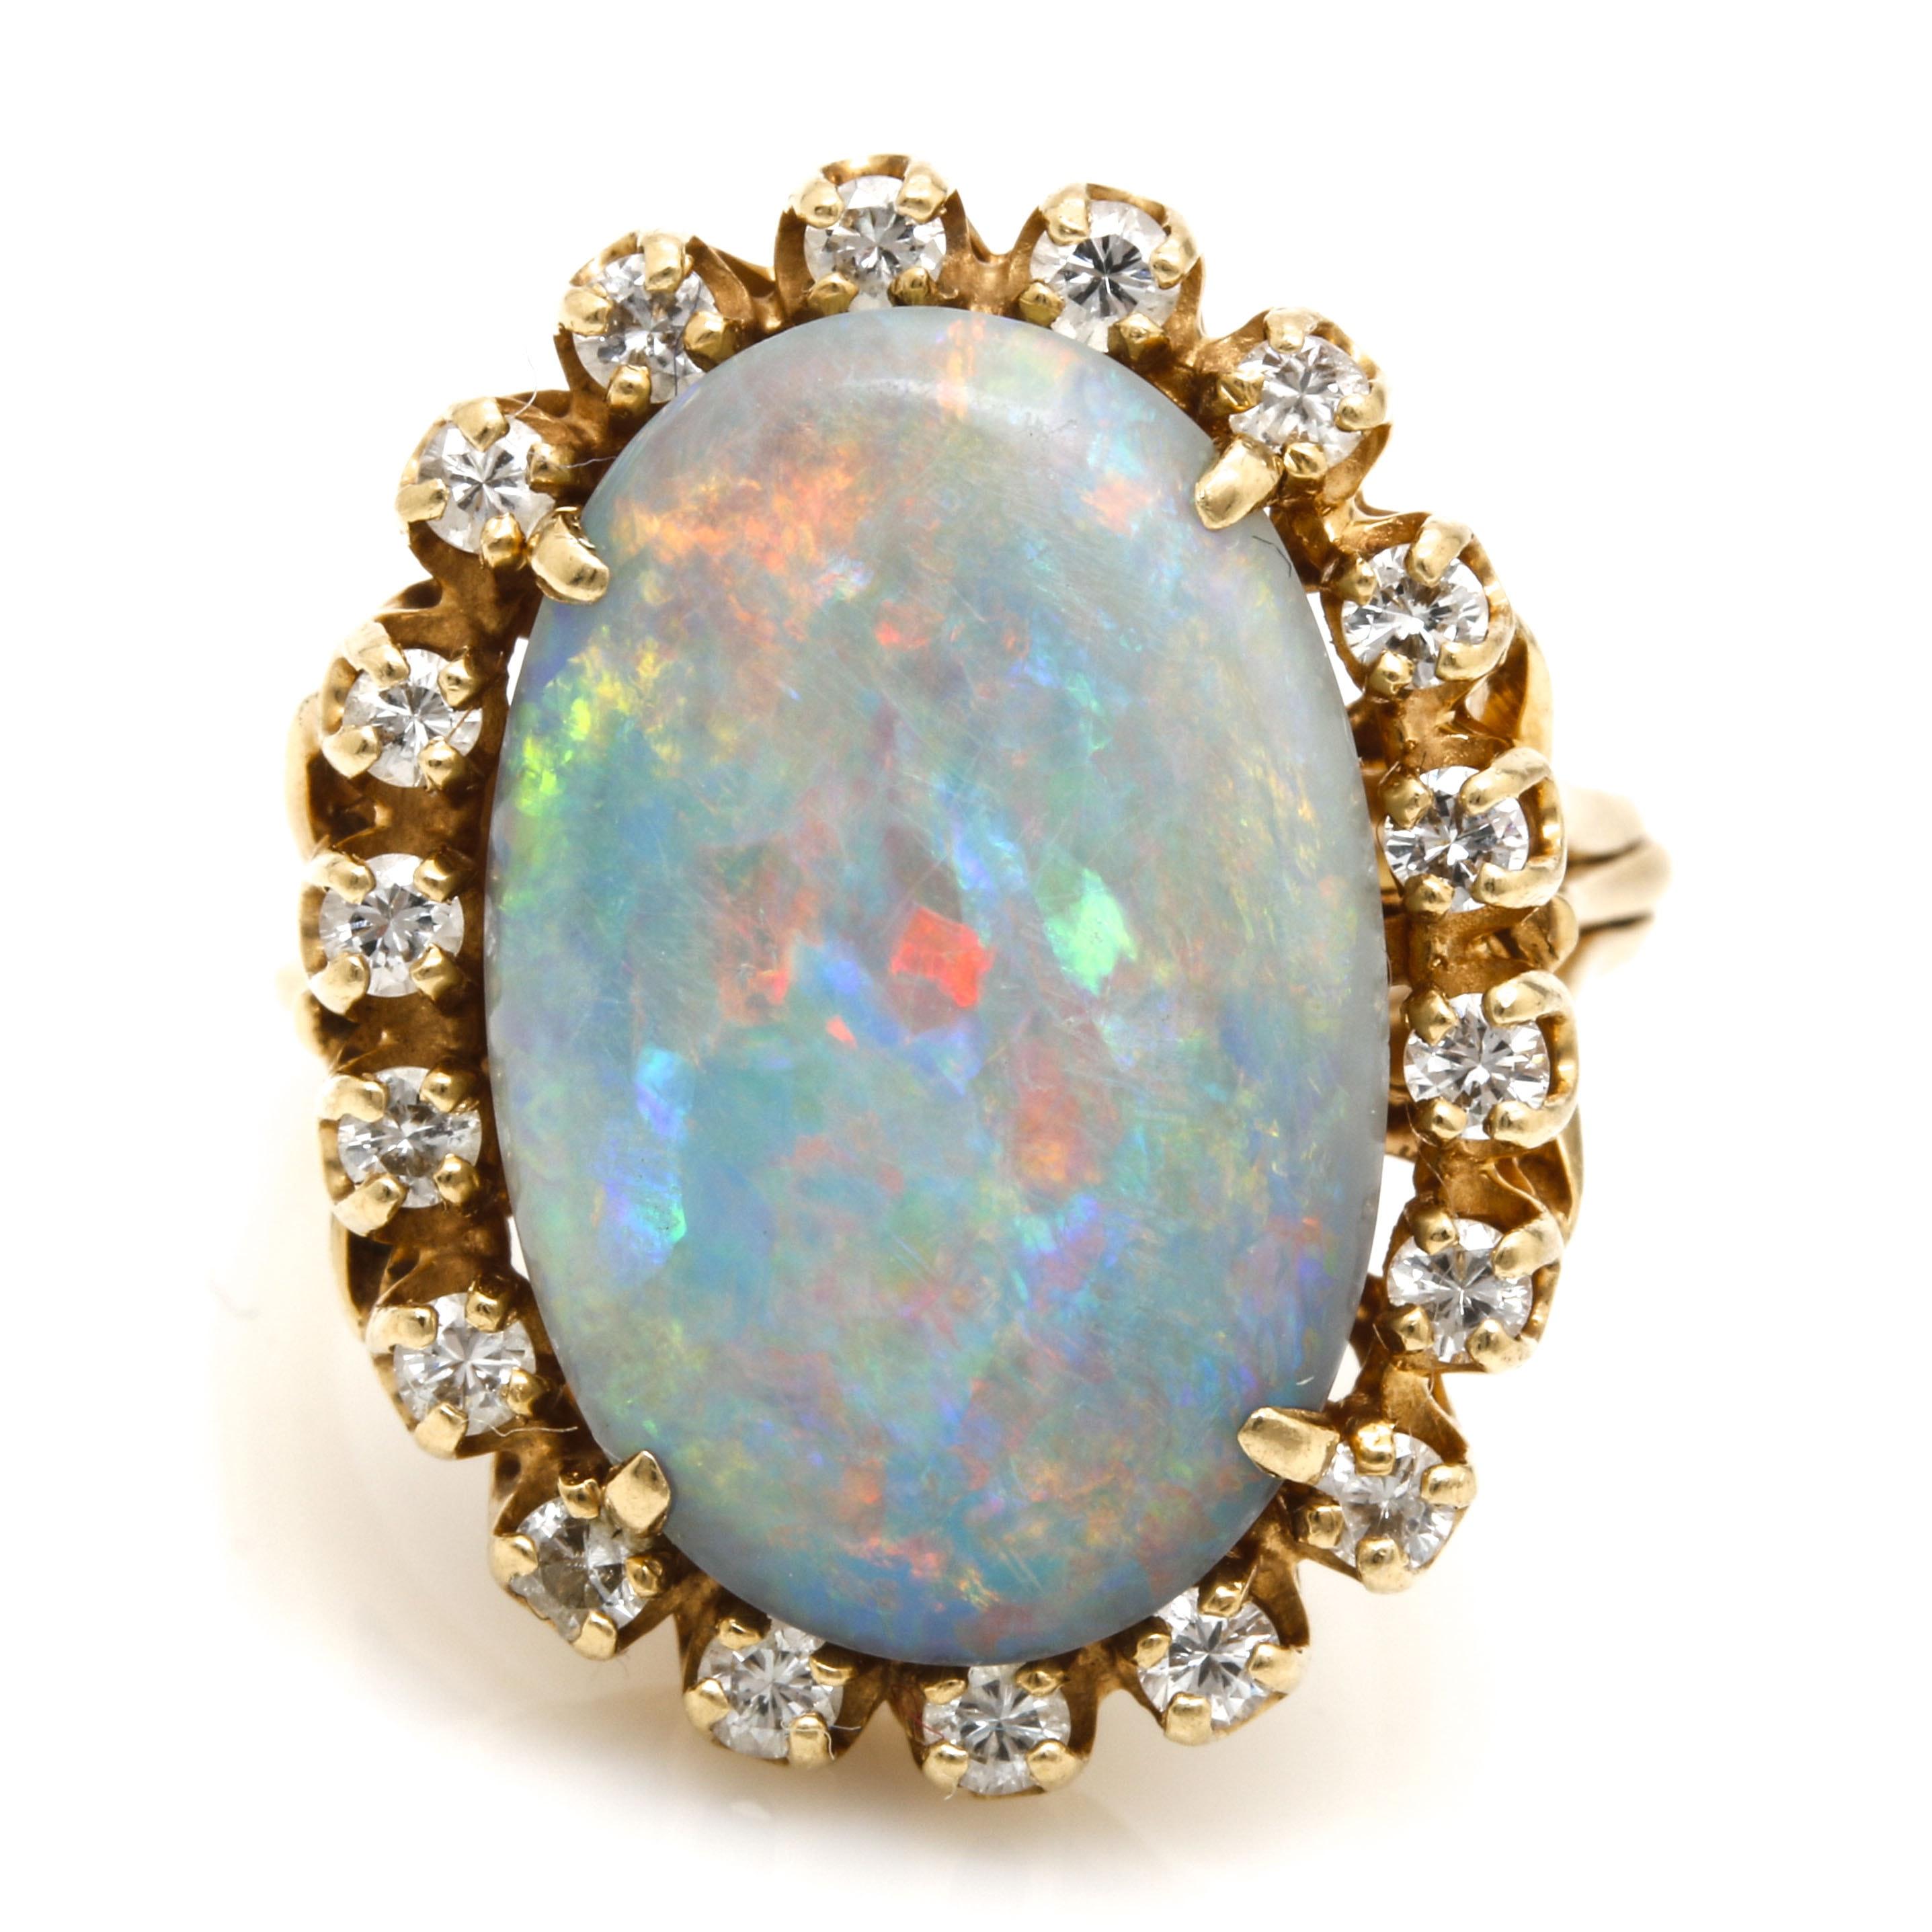 14K Yellow Gold Opal and Diamond Statement Ring